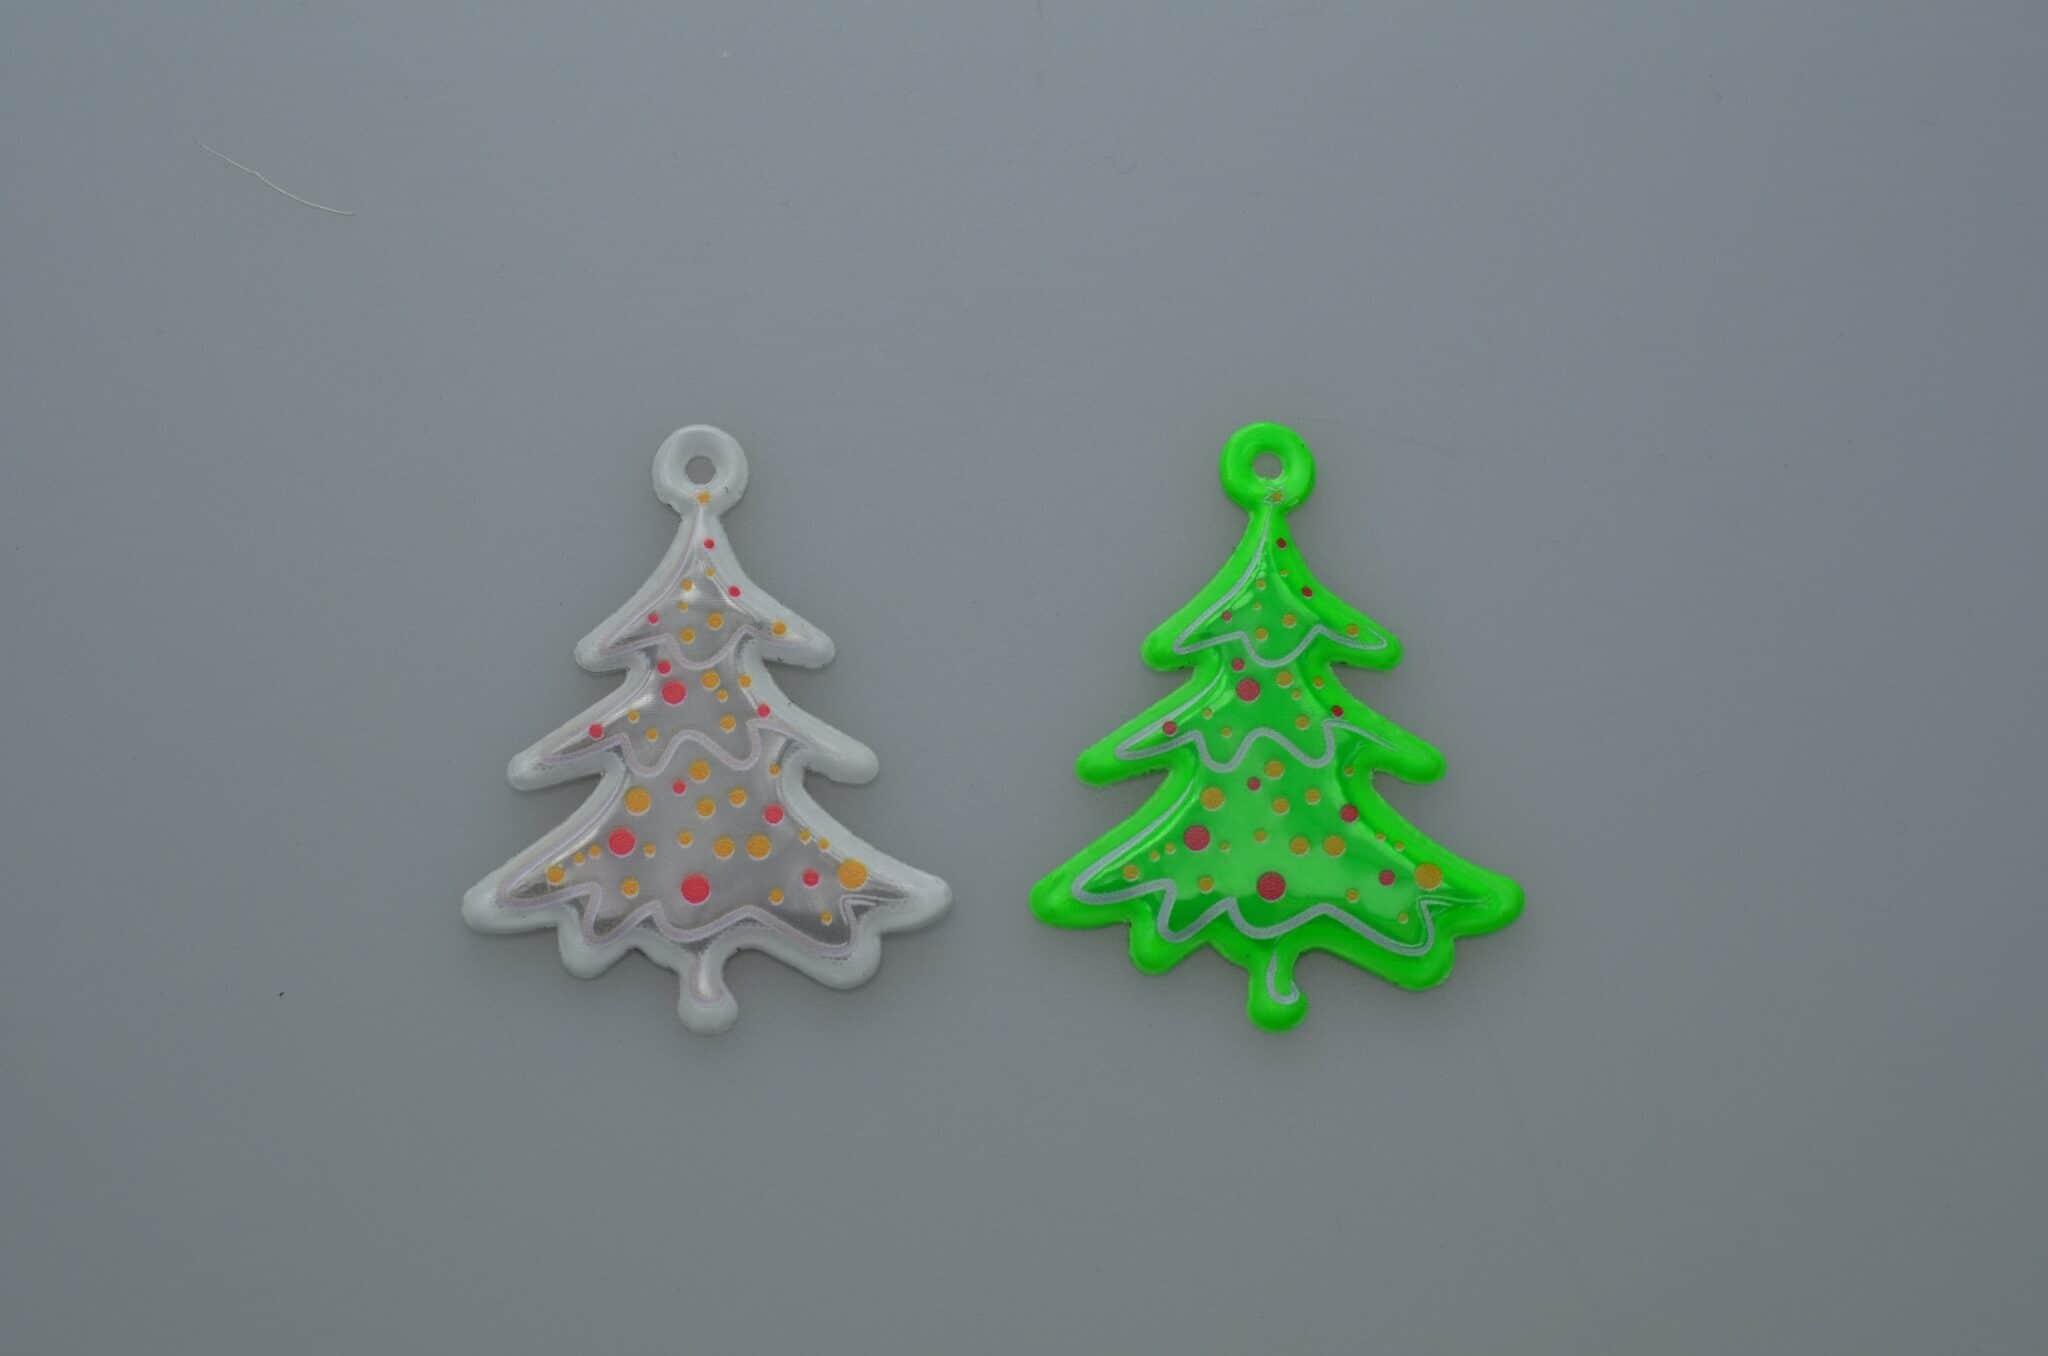 Refleks som juletræ med logo